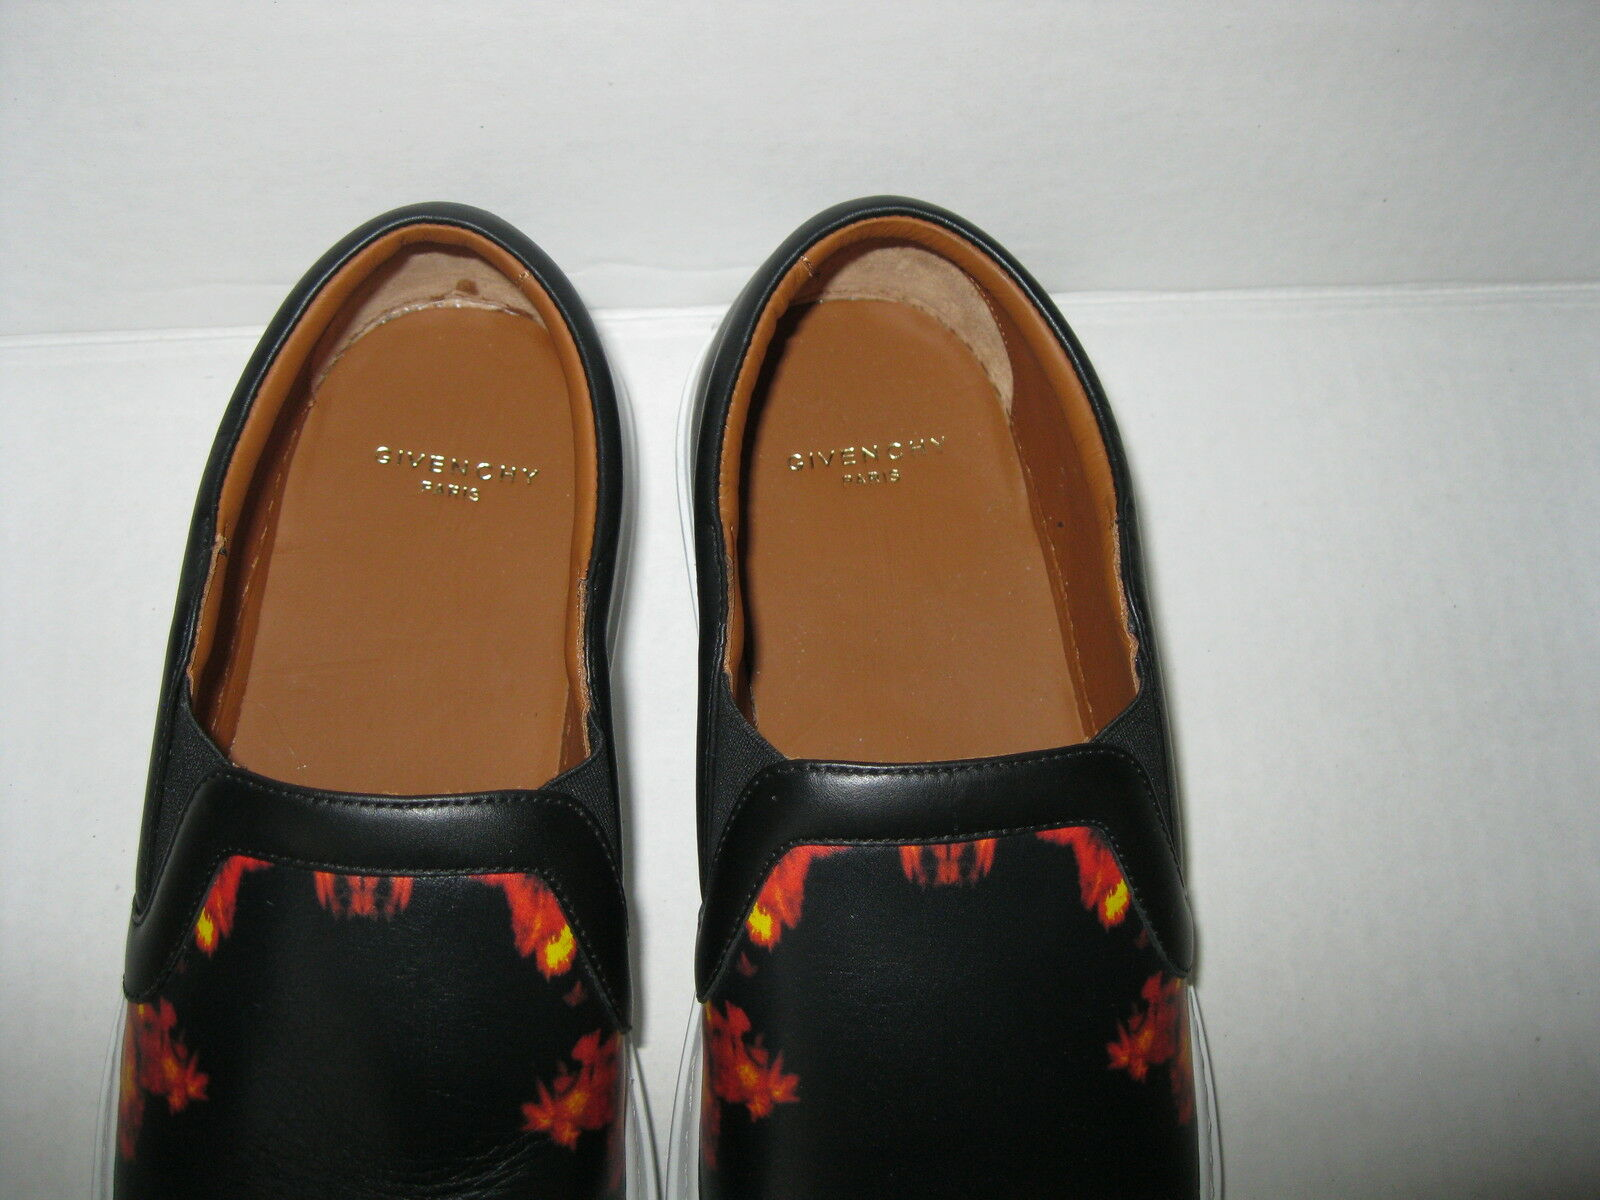 Givenchy Fire Flame Print Print Print Leather Slip On scarpe da ginnastica Skate scarpe 40 1 2, 10 1 2 fc2a6b